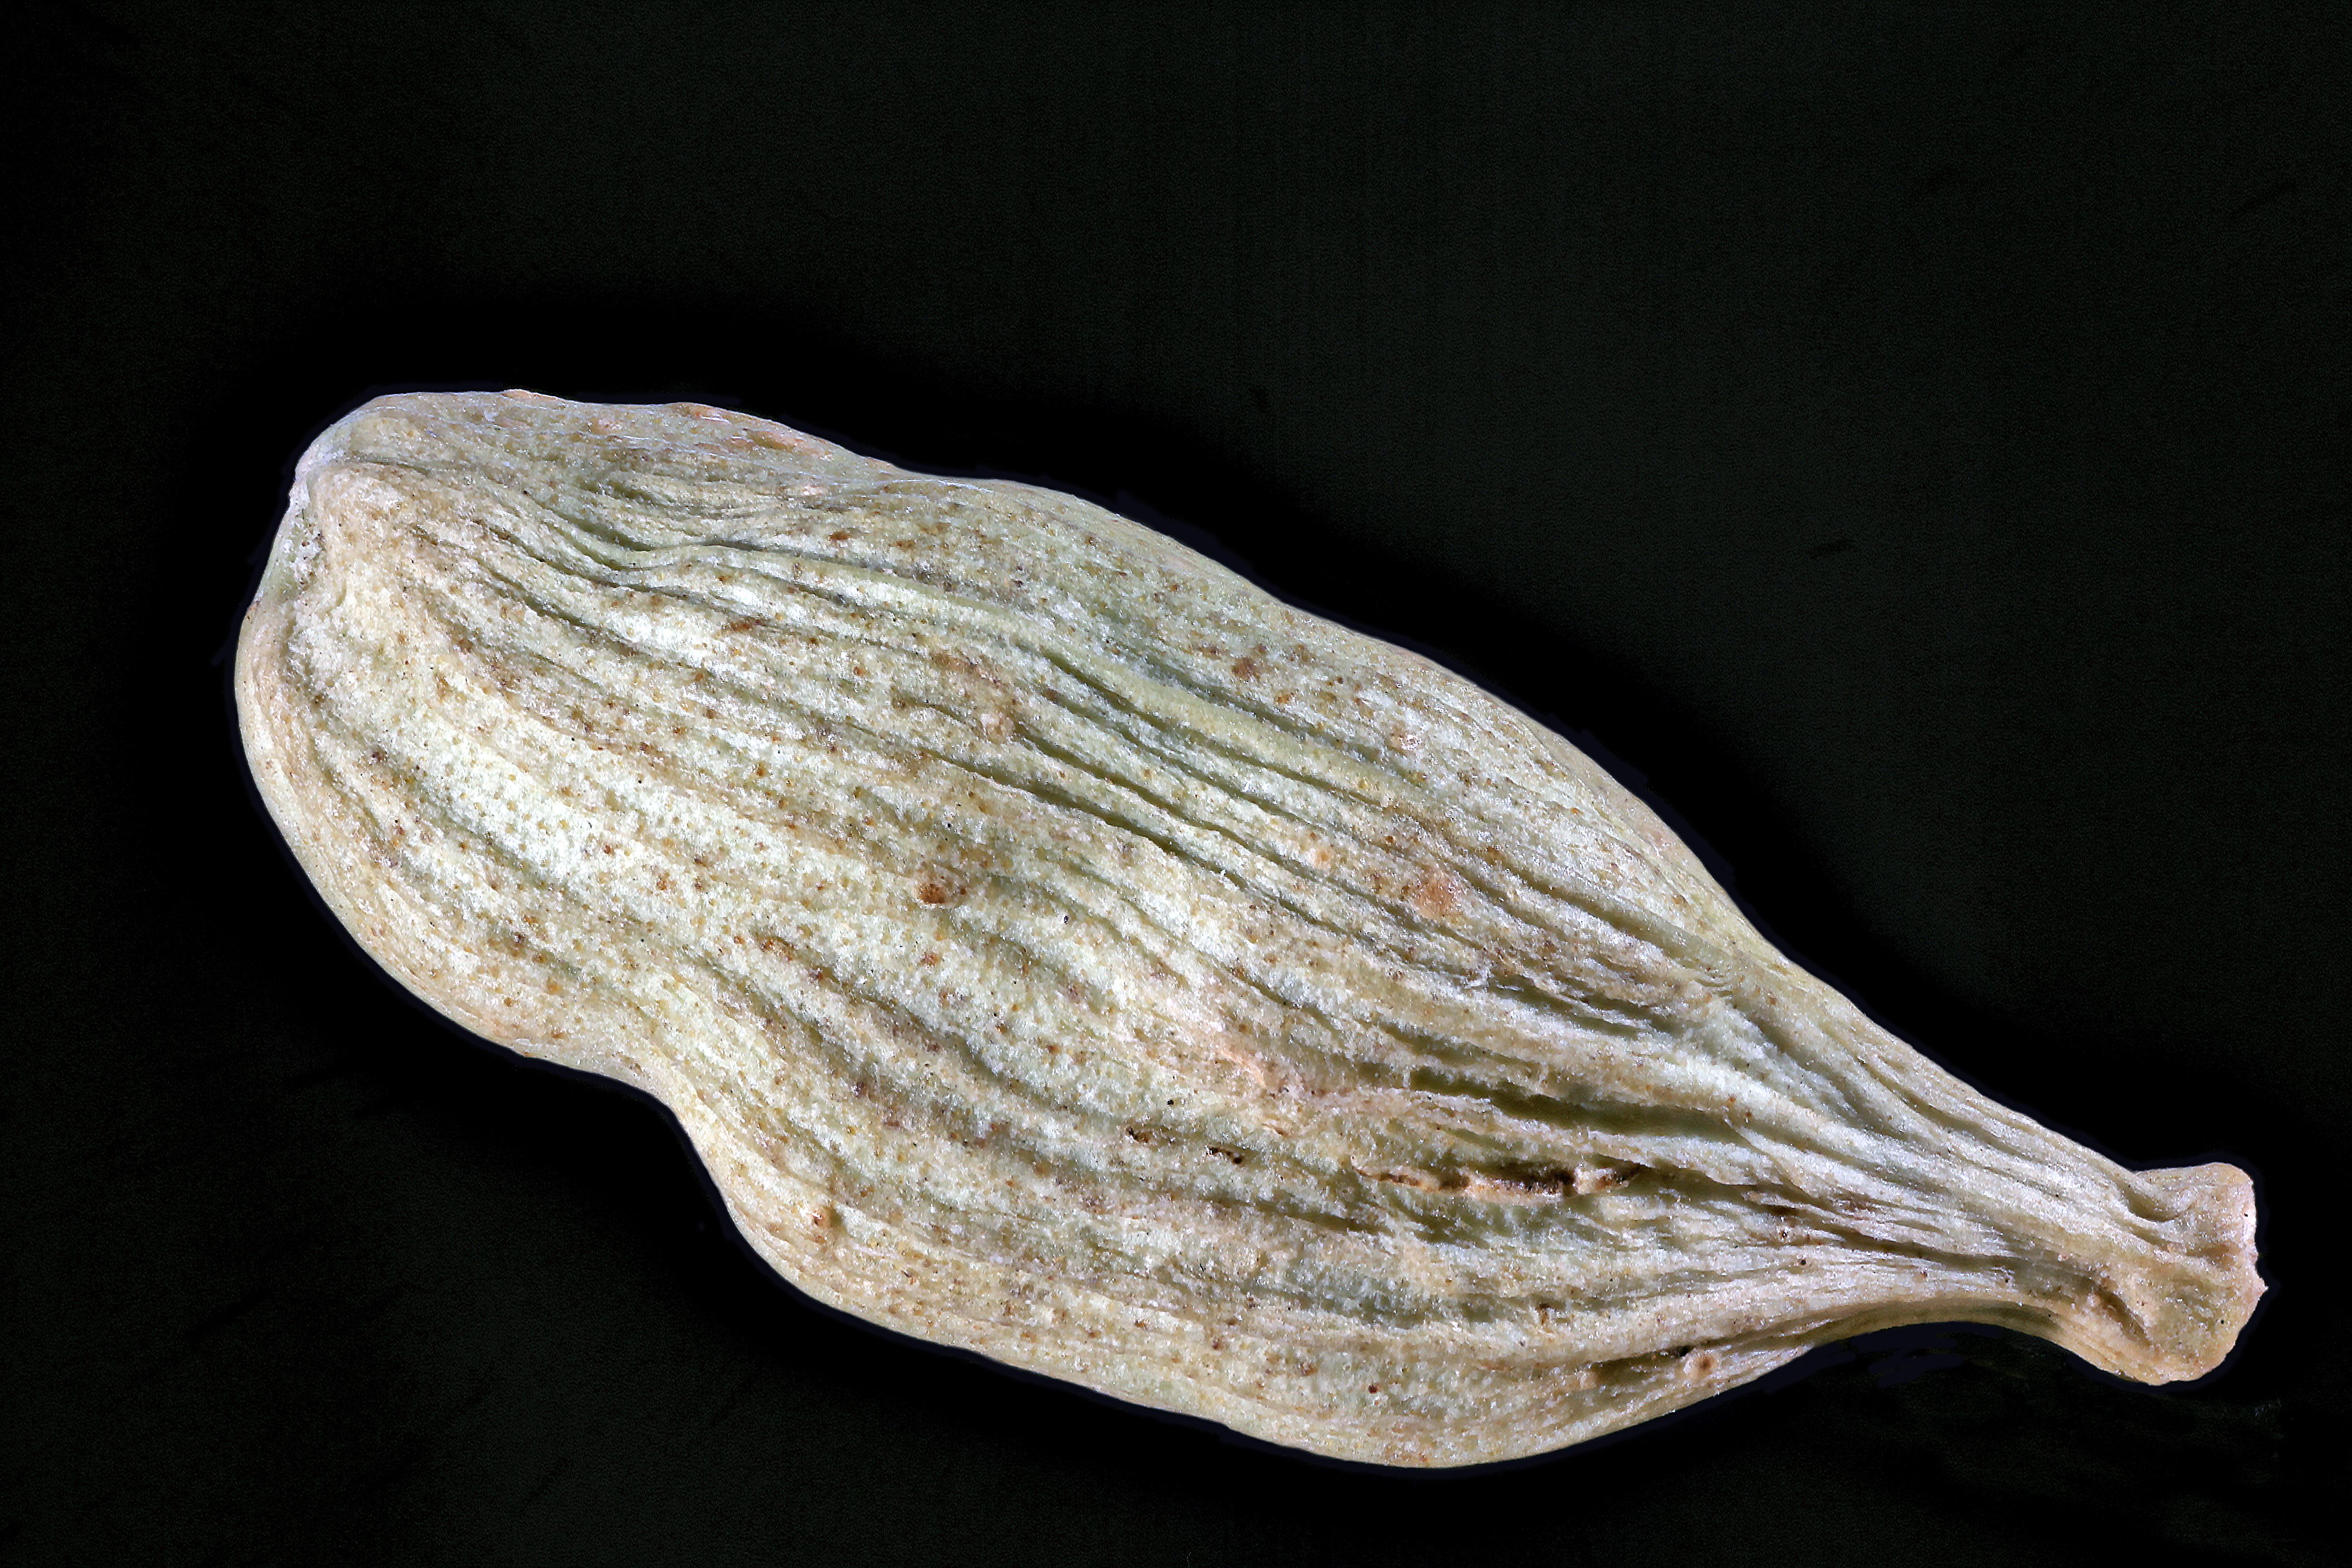 Cardamom Pod